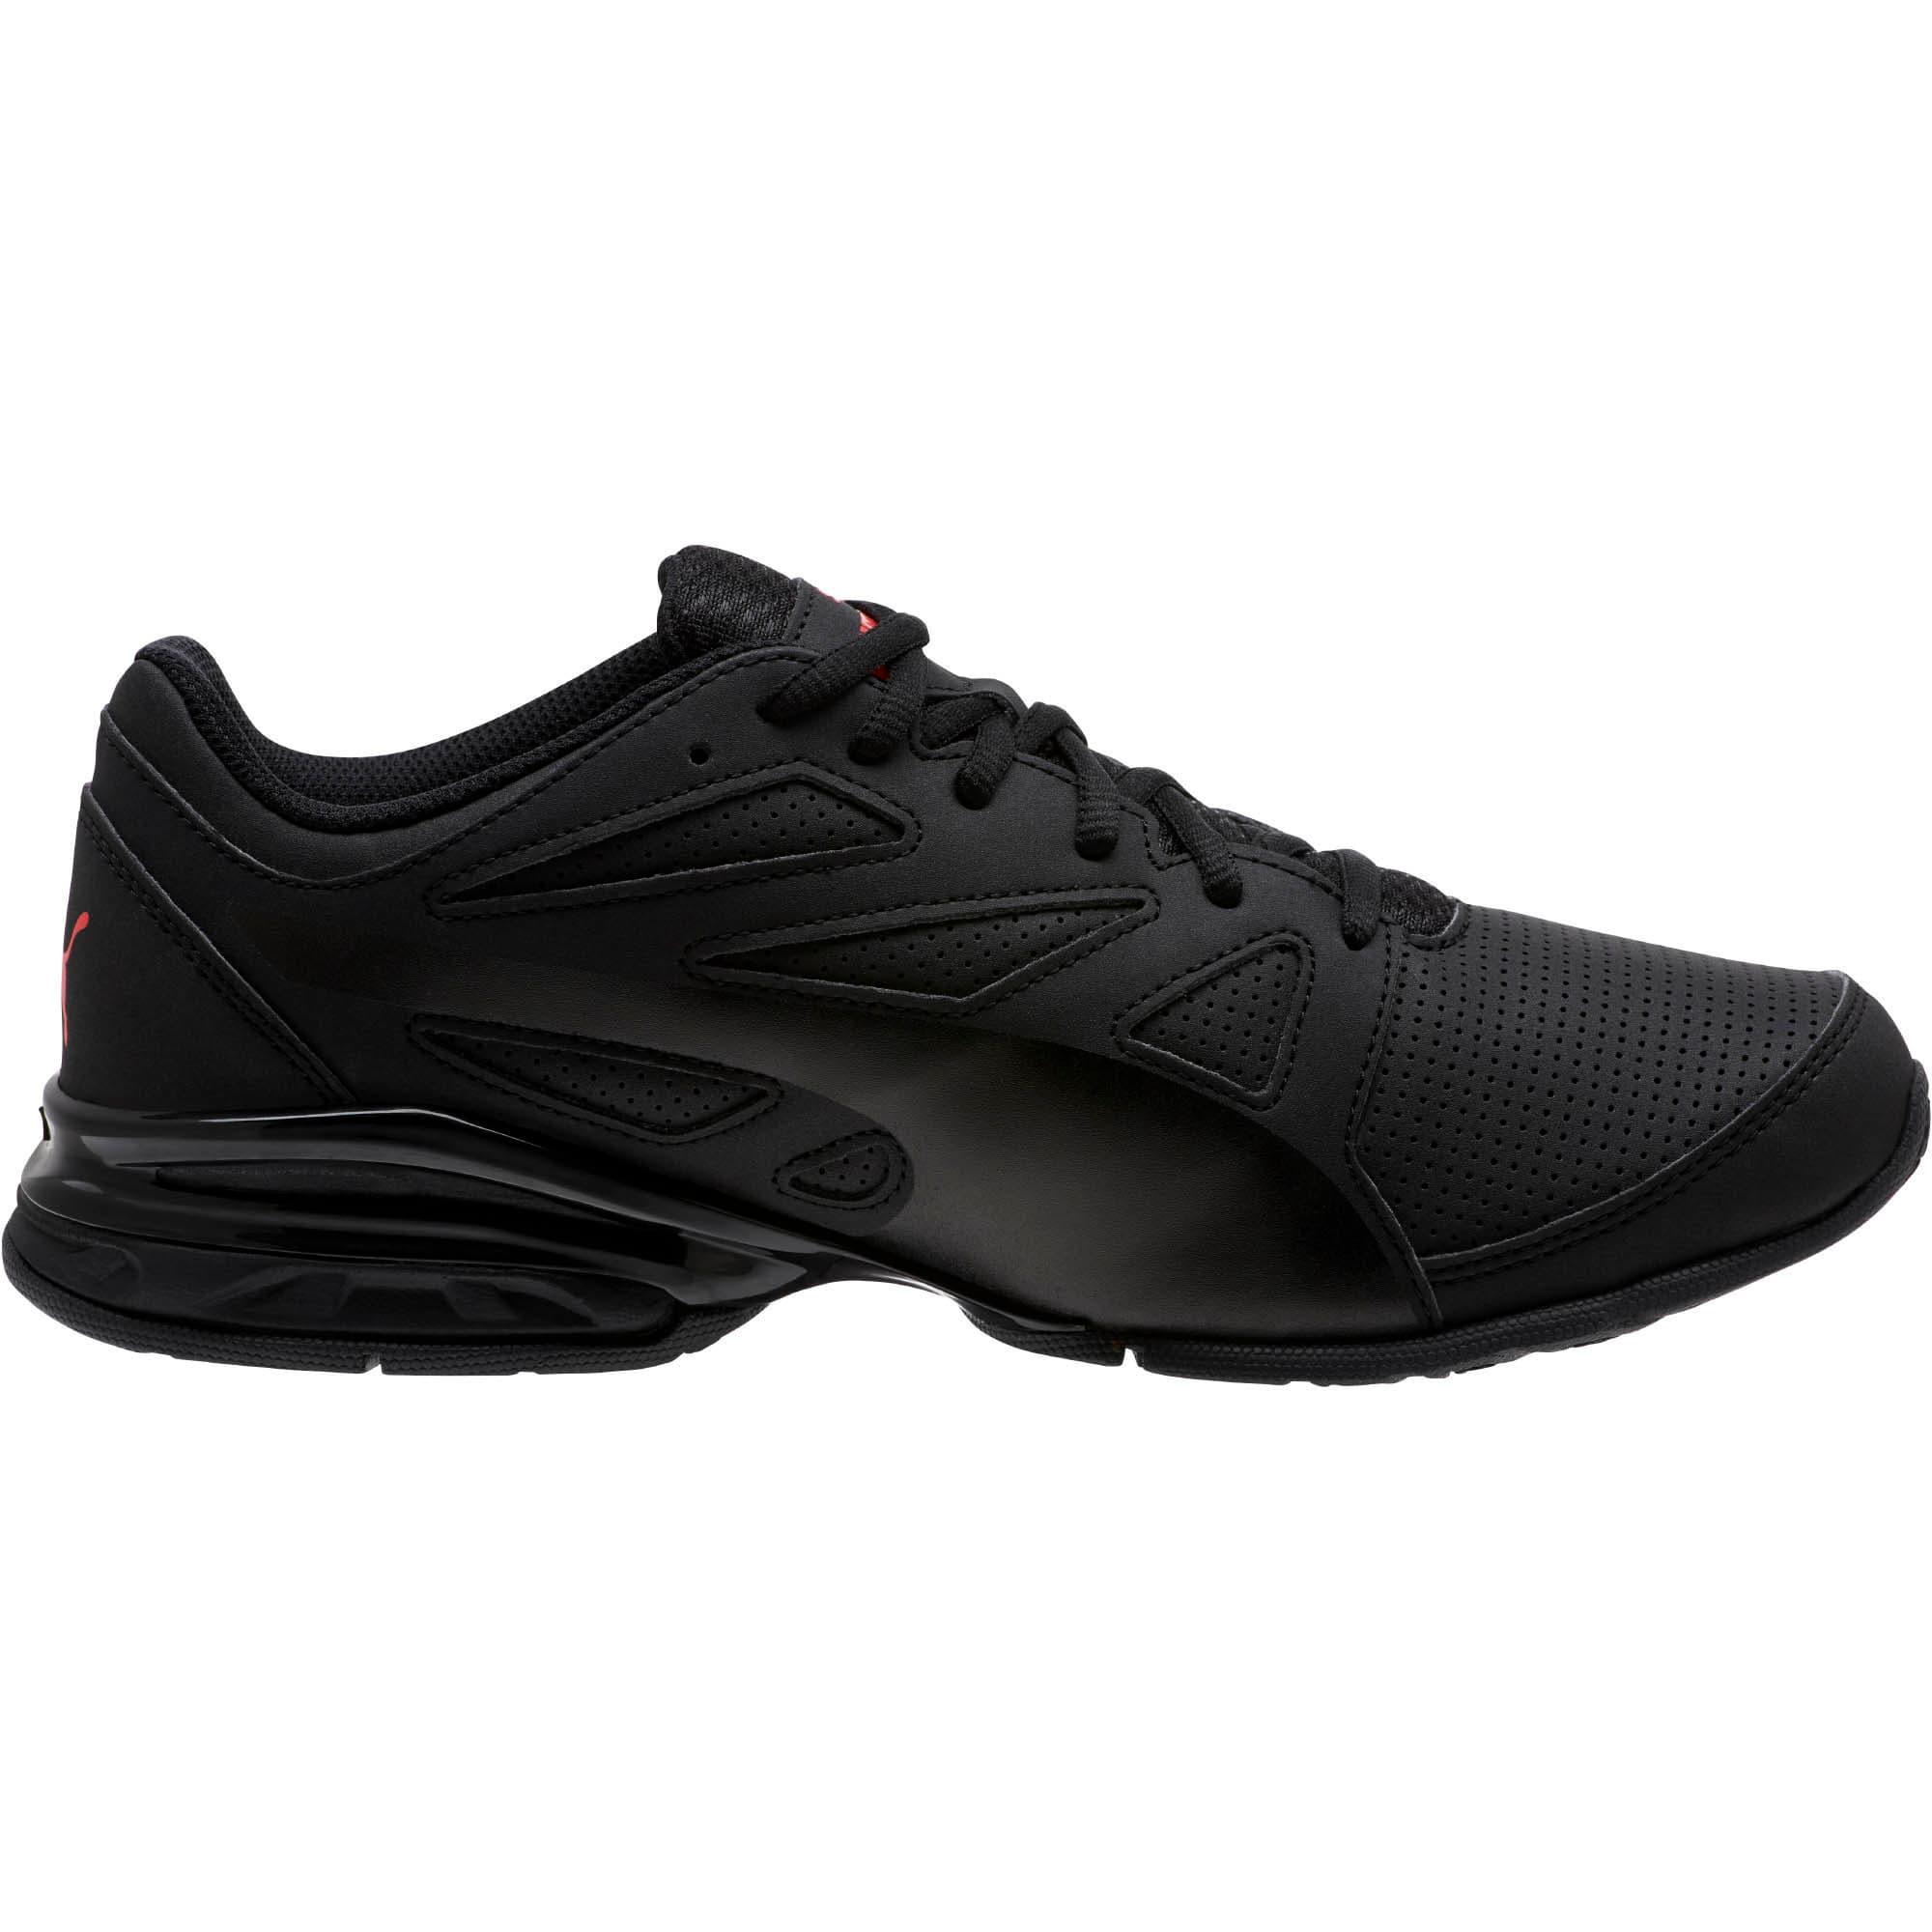 Thumbnail 3 of Tazon Modern SL FM Men's Sneakers, Puma Black-high risk red, medium